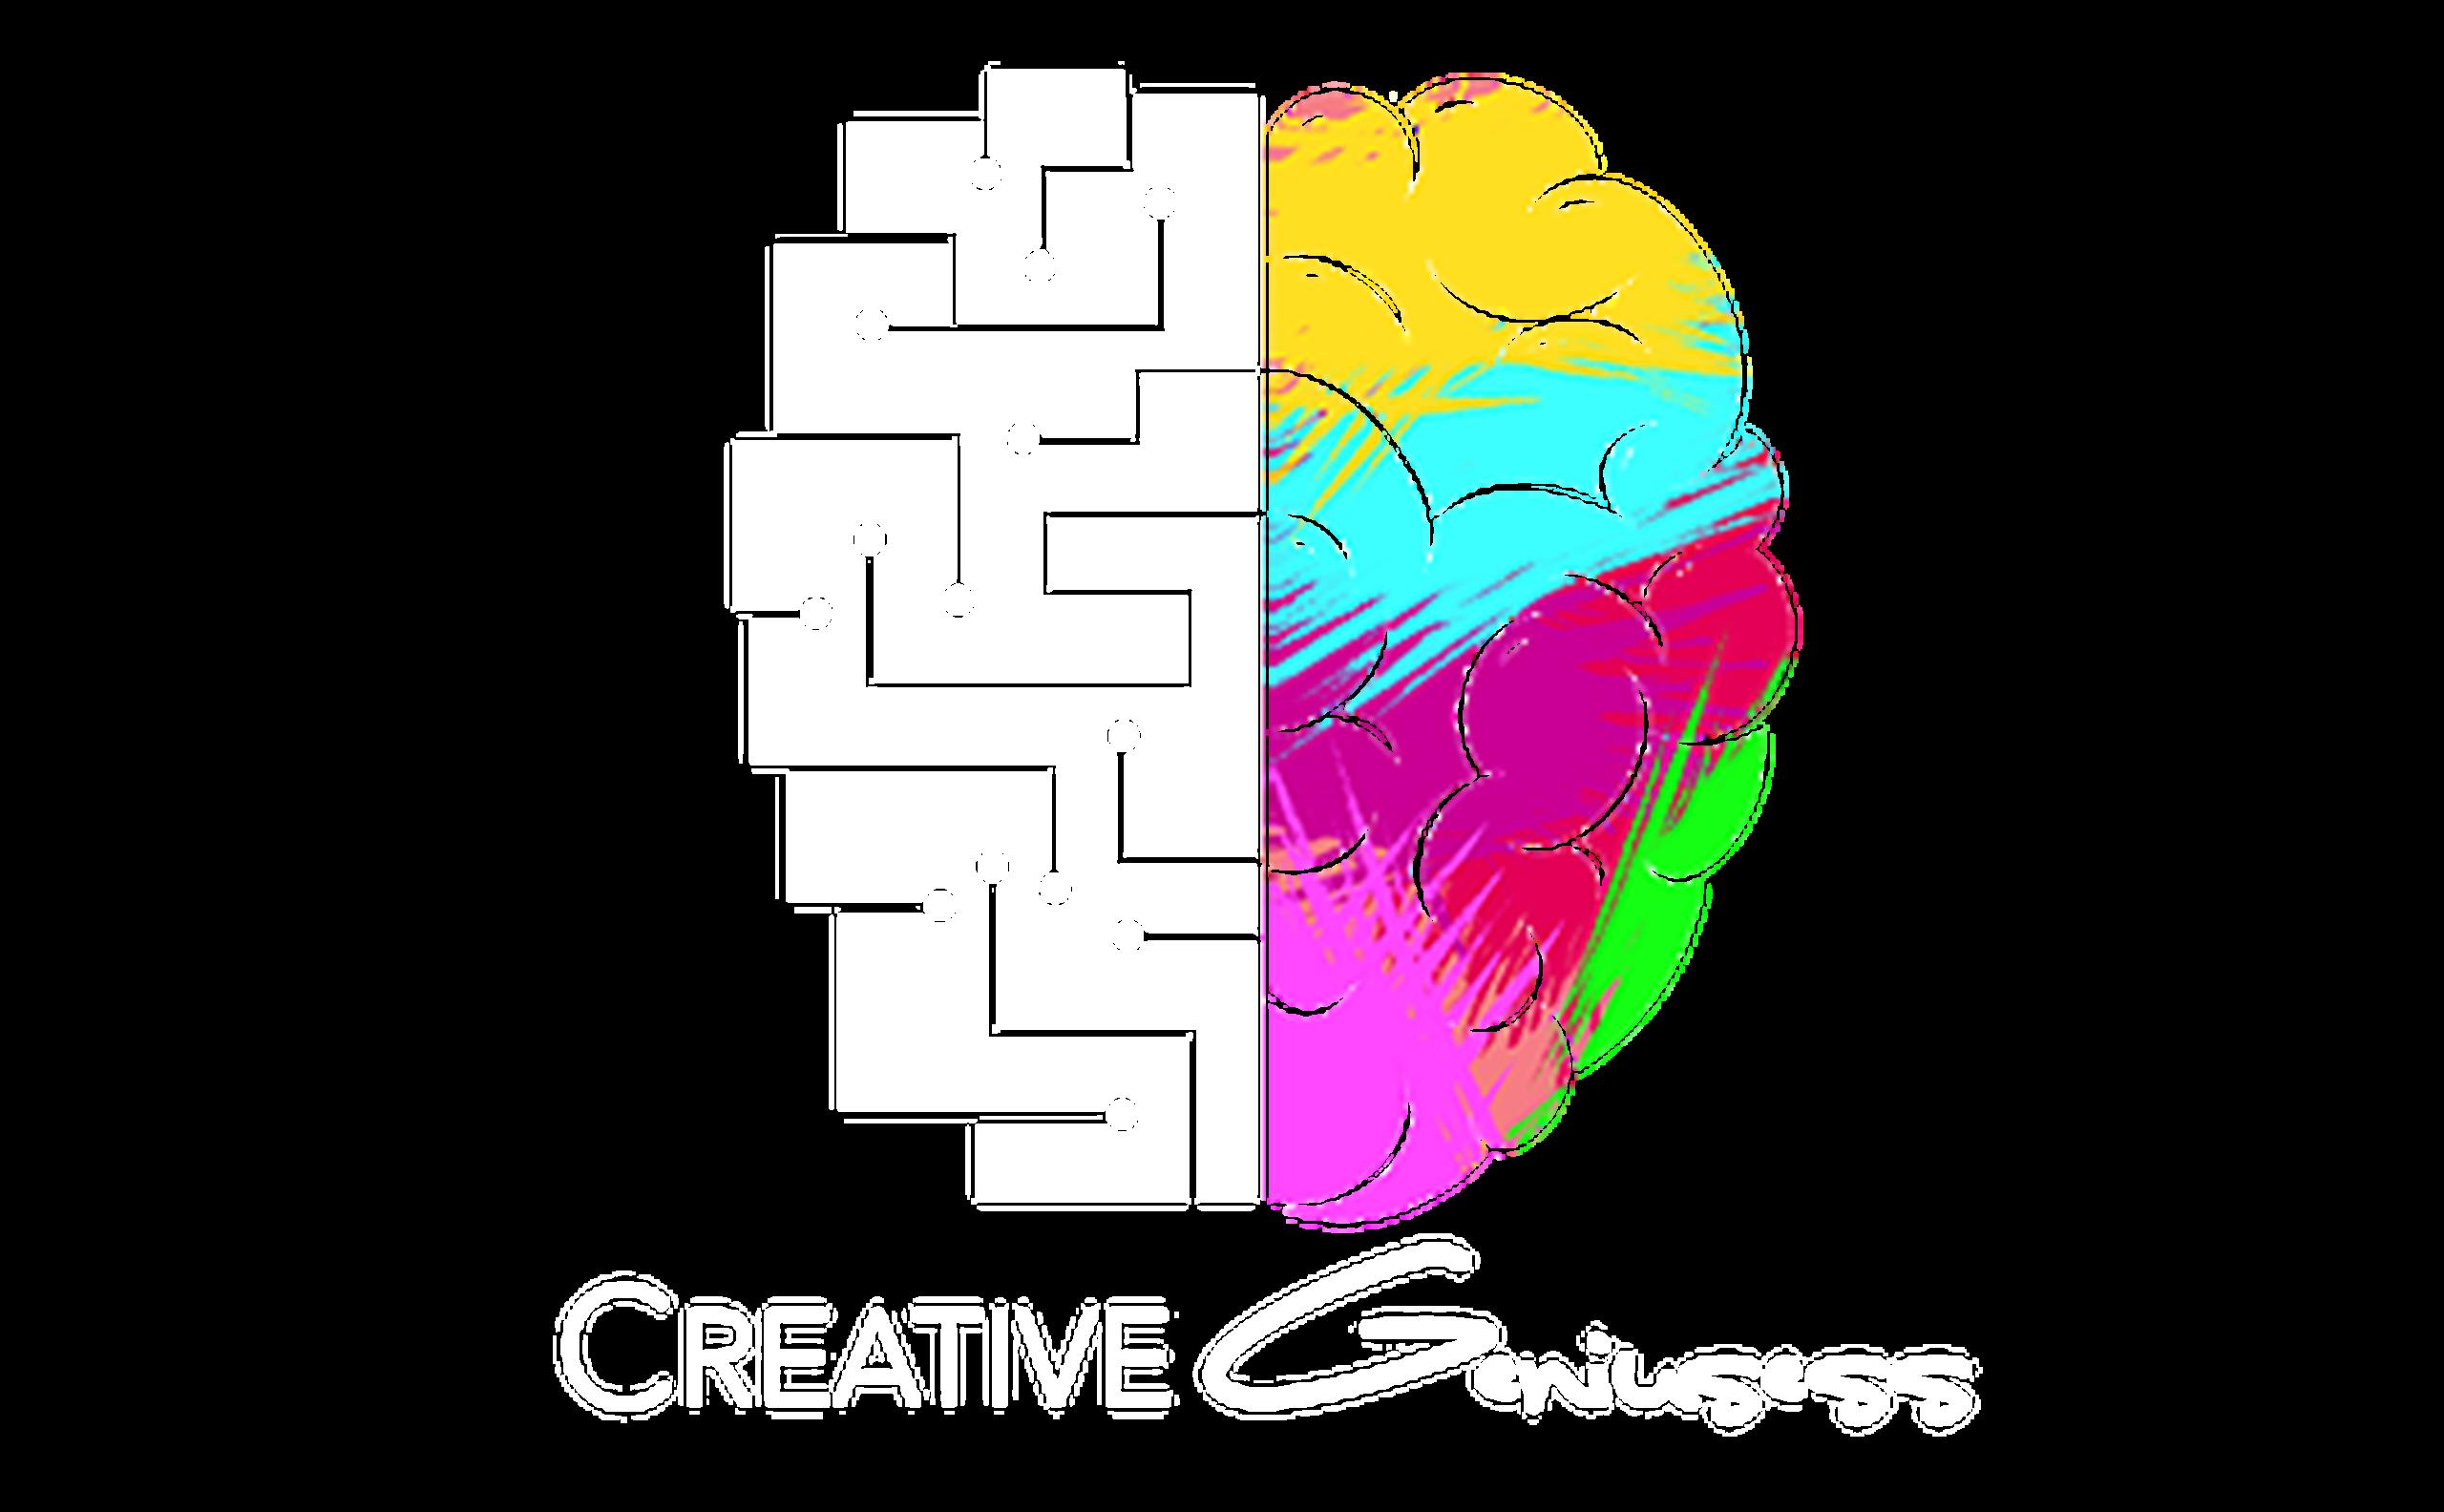 Creative Geniusess